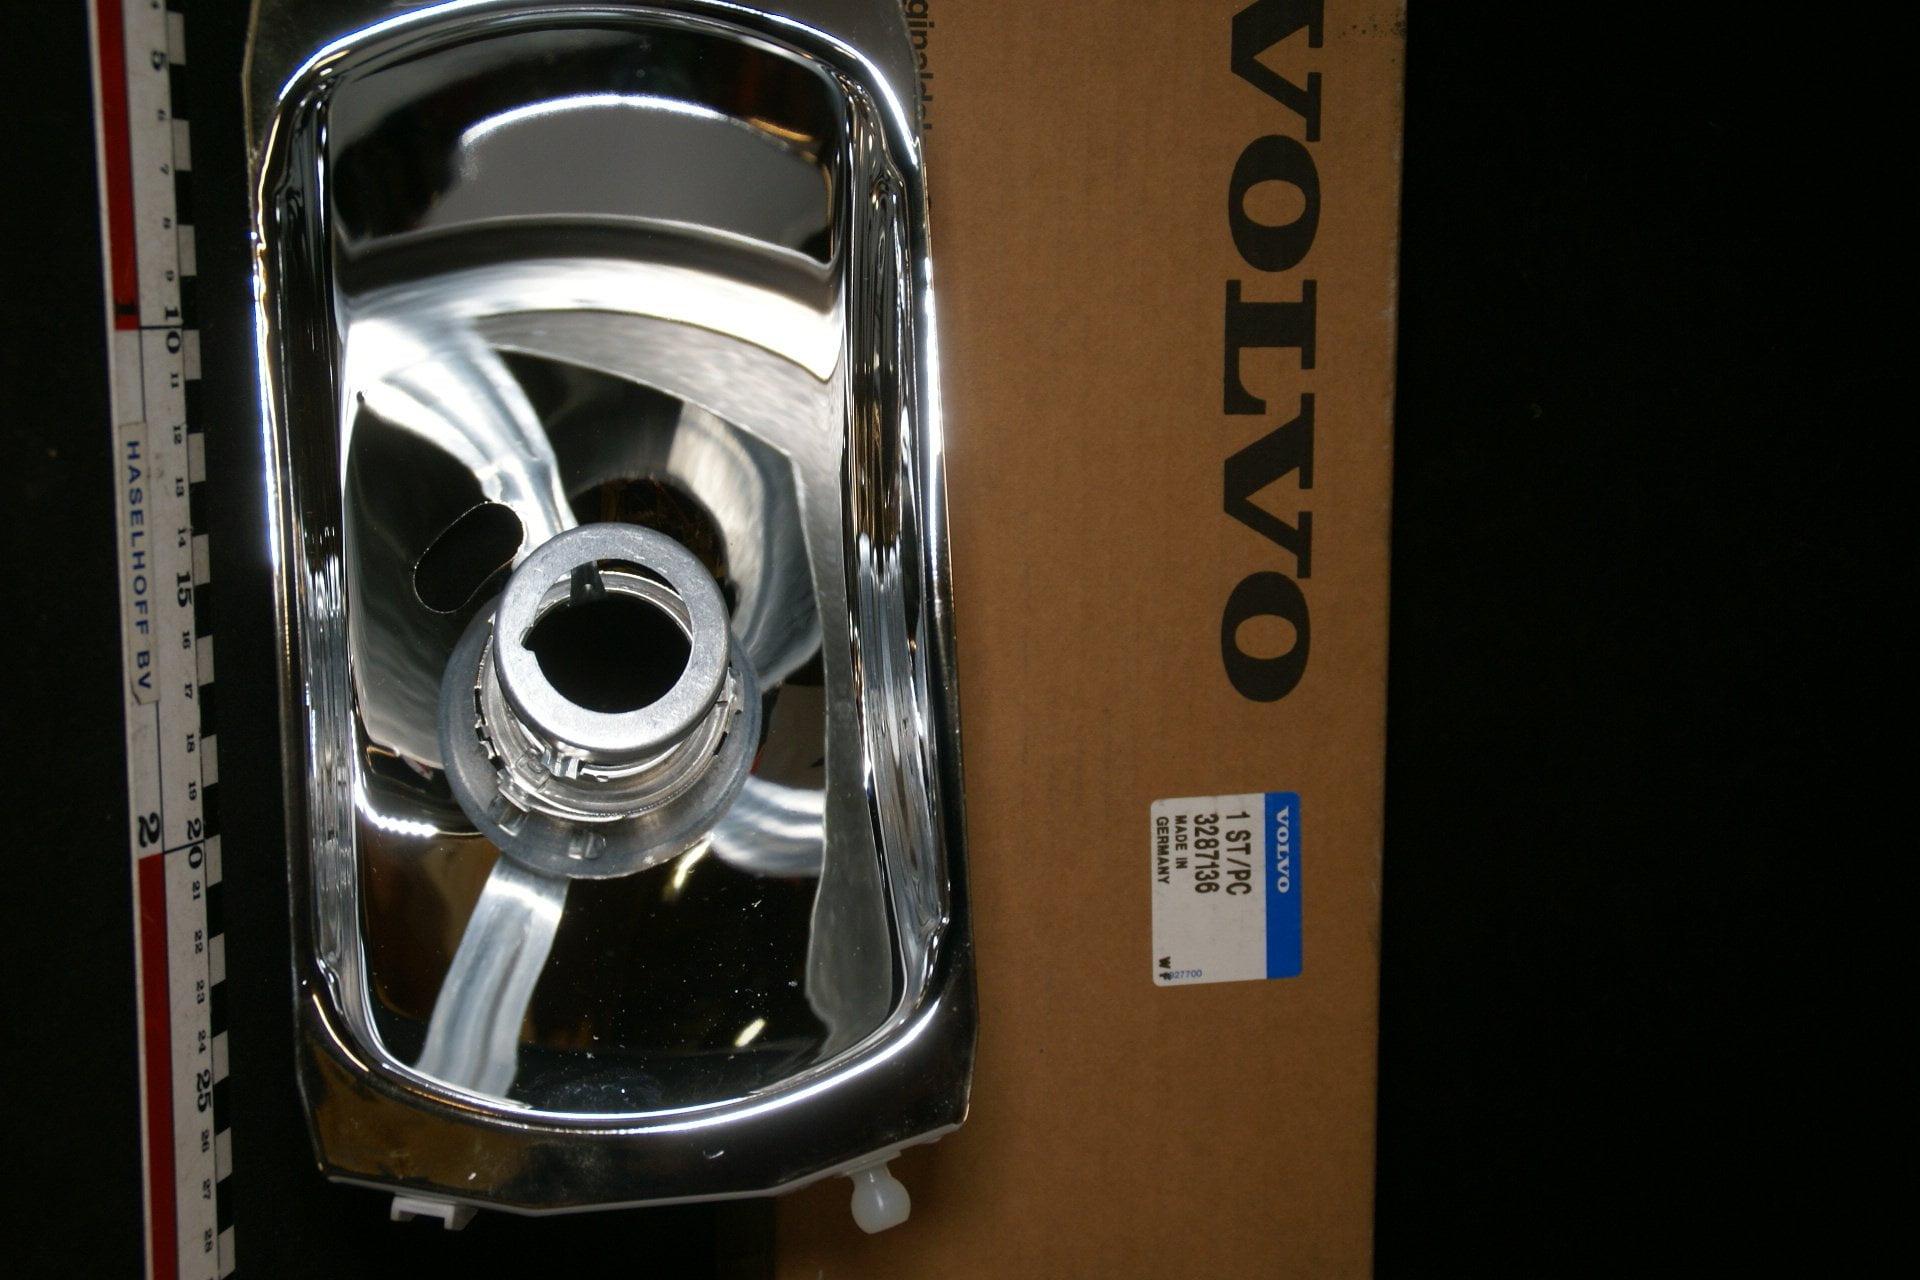 DSC00010 Volvo koplampreflector NOS